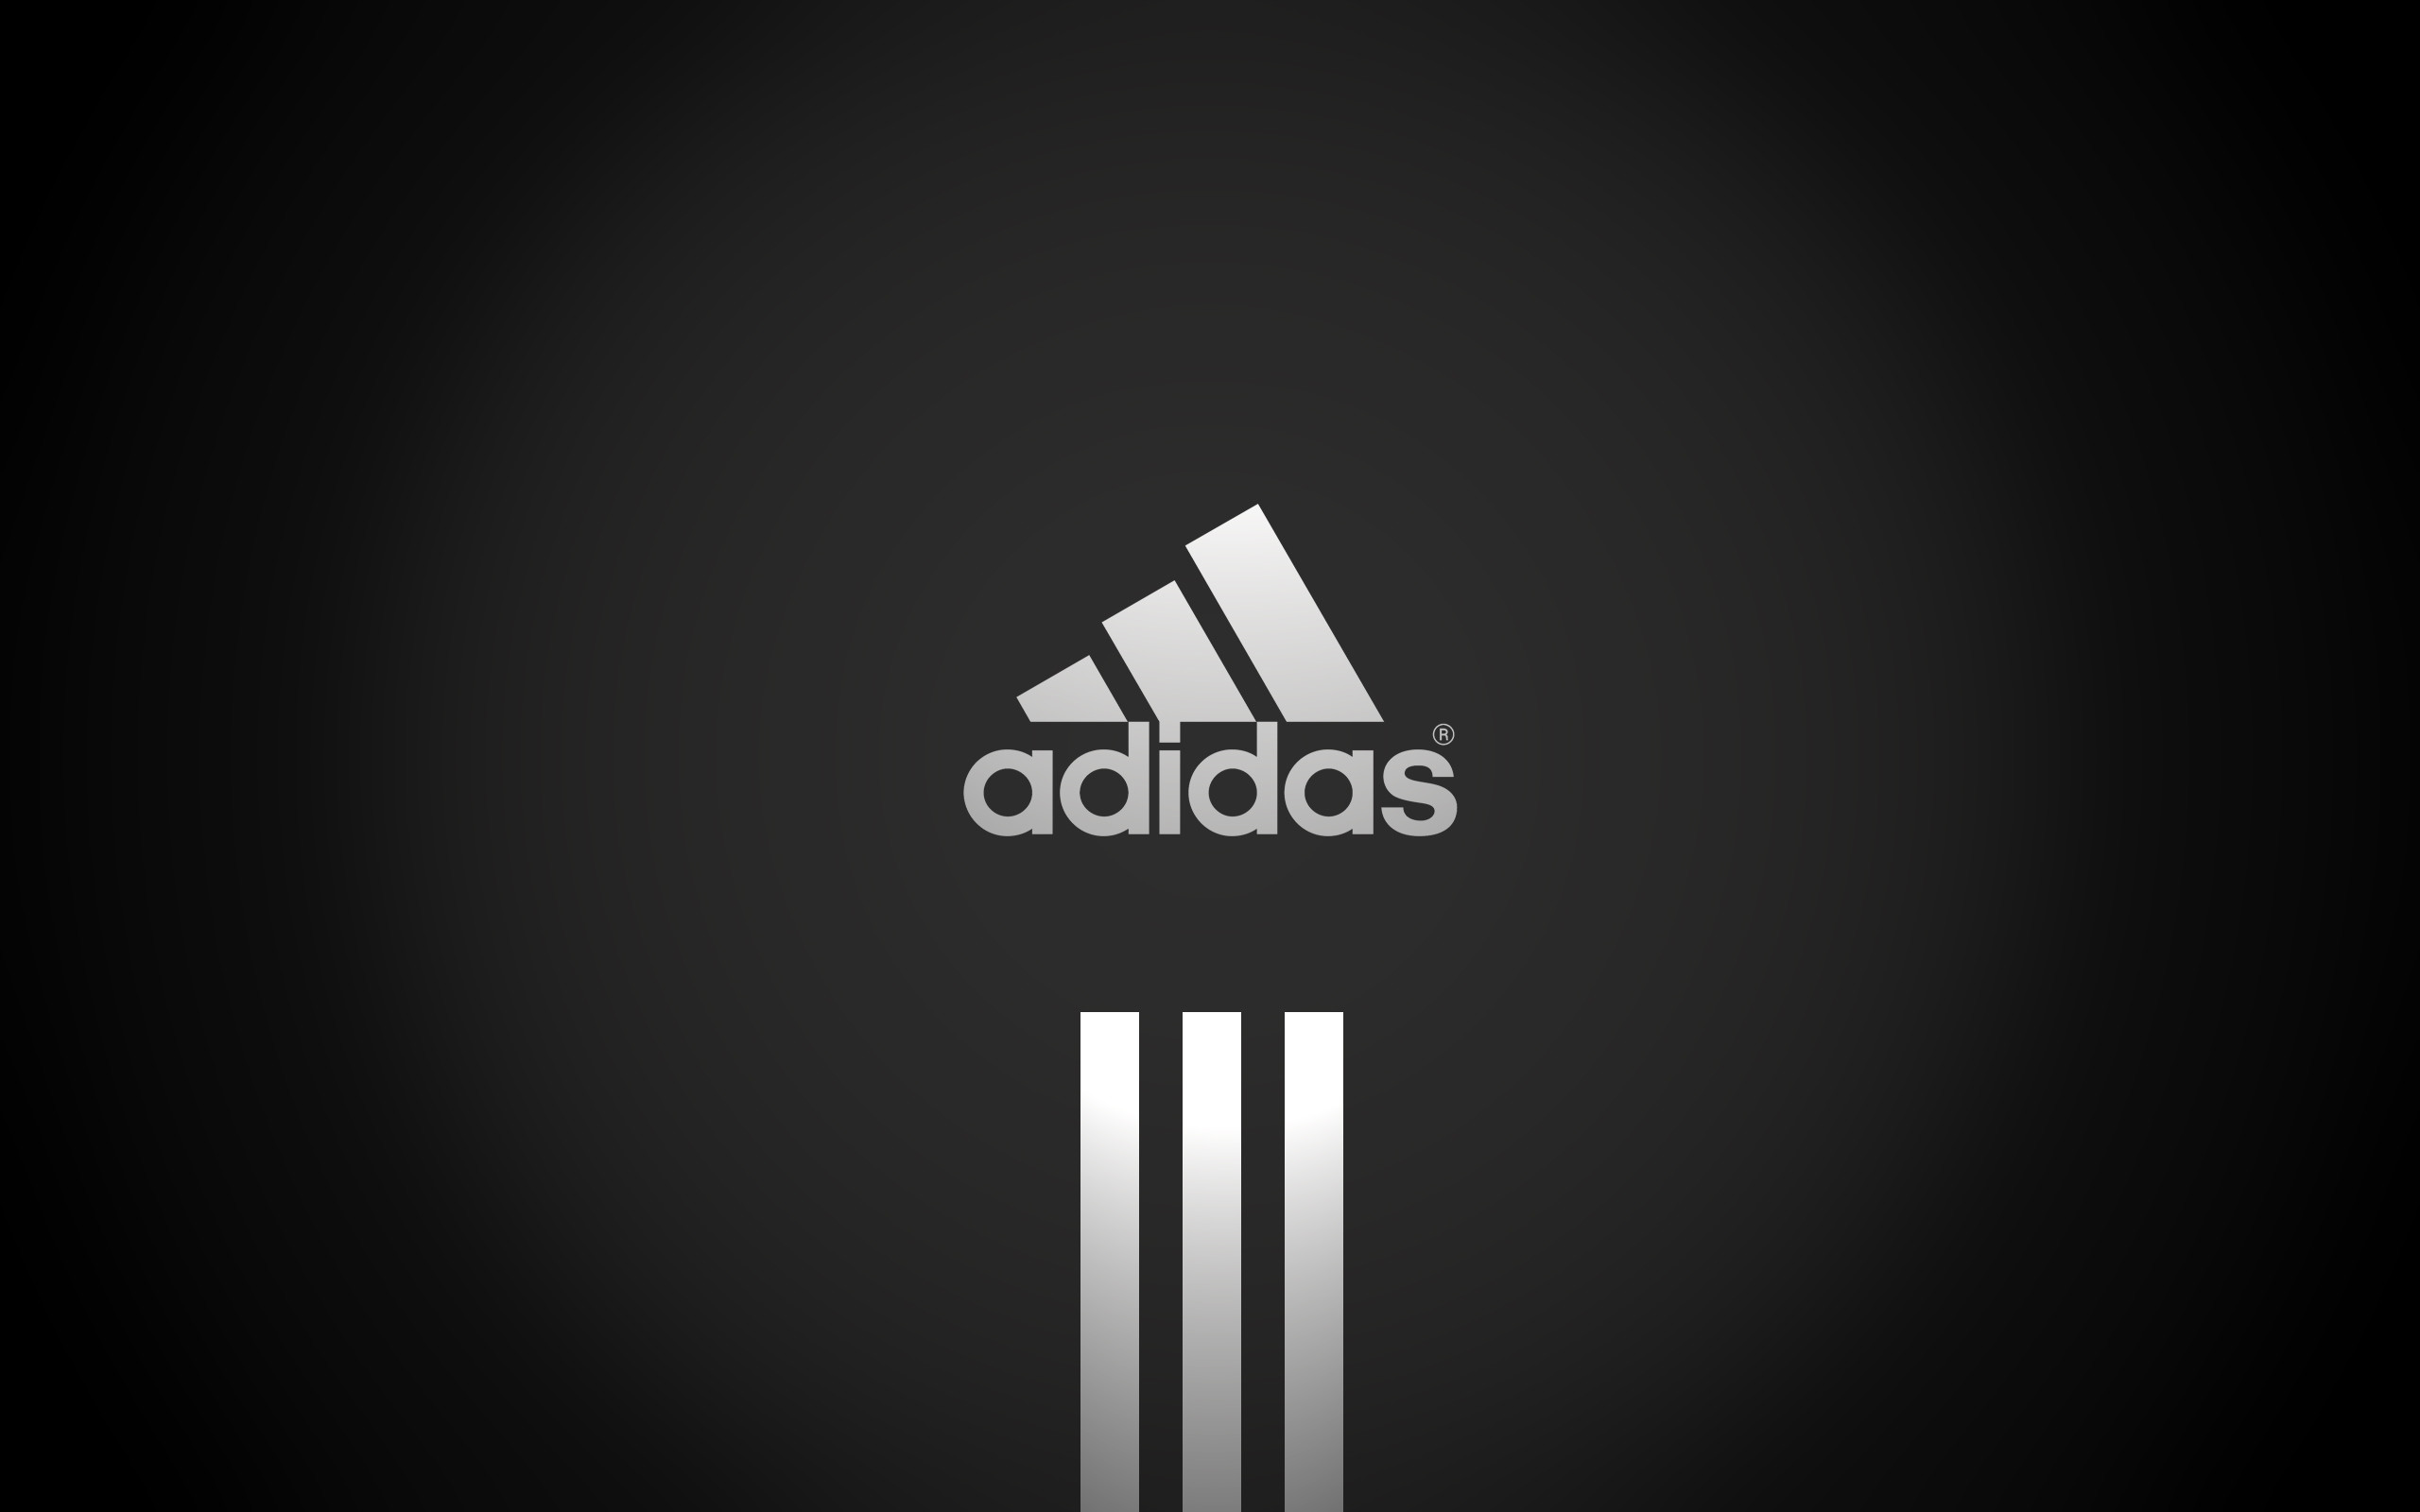 Adidas Logo Wallpaper 2018 69 Pictures